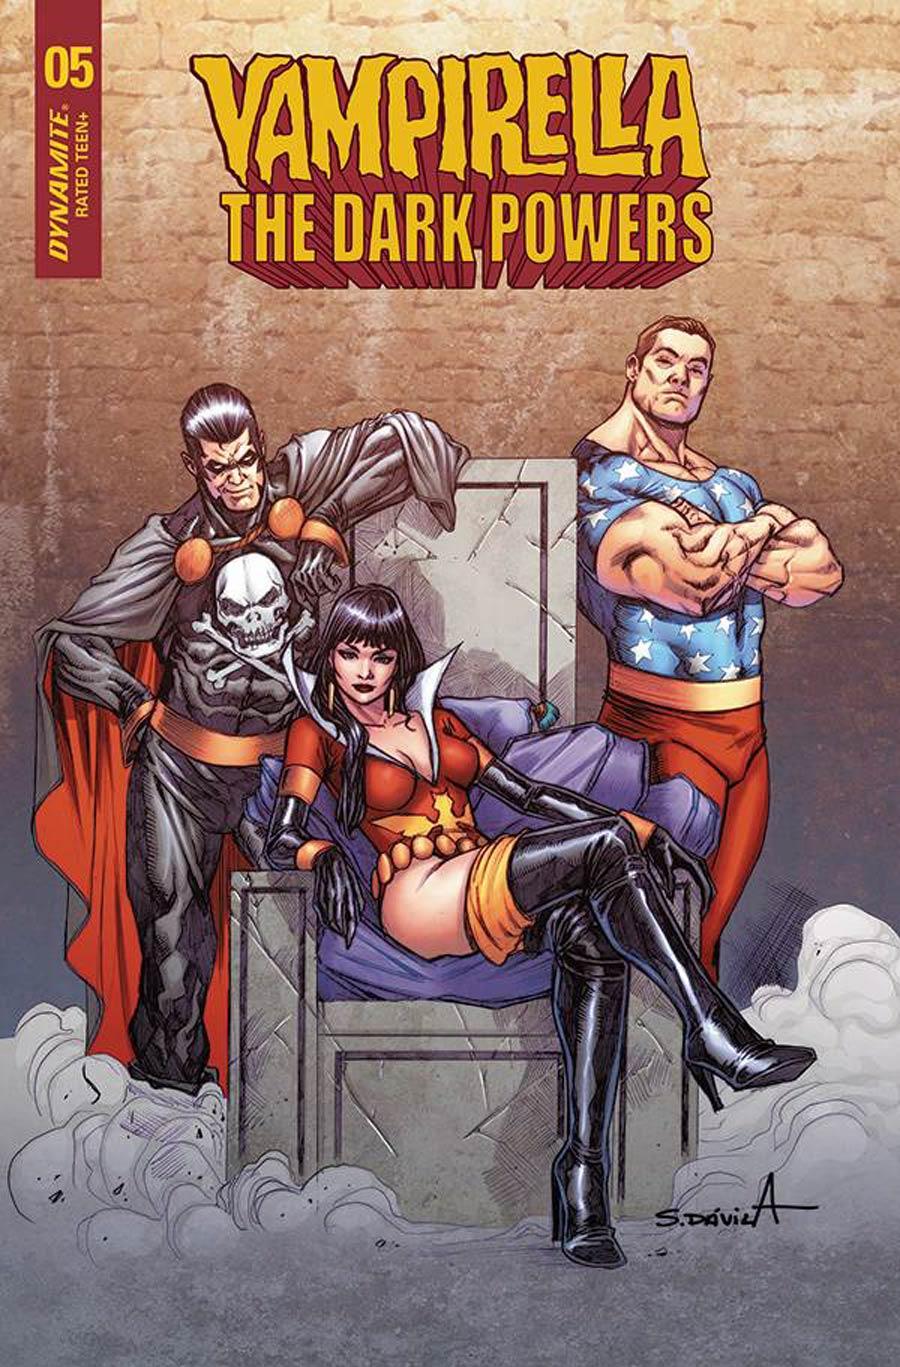 Vampirella The Dark Powers #5 Cover G Variant Sergio Davila Cover